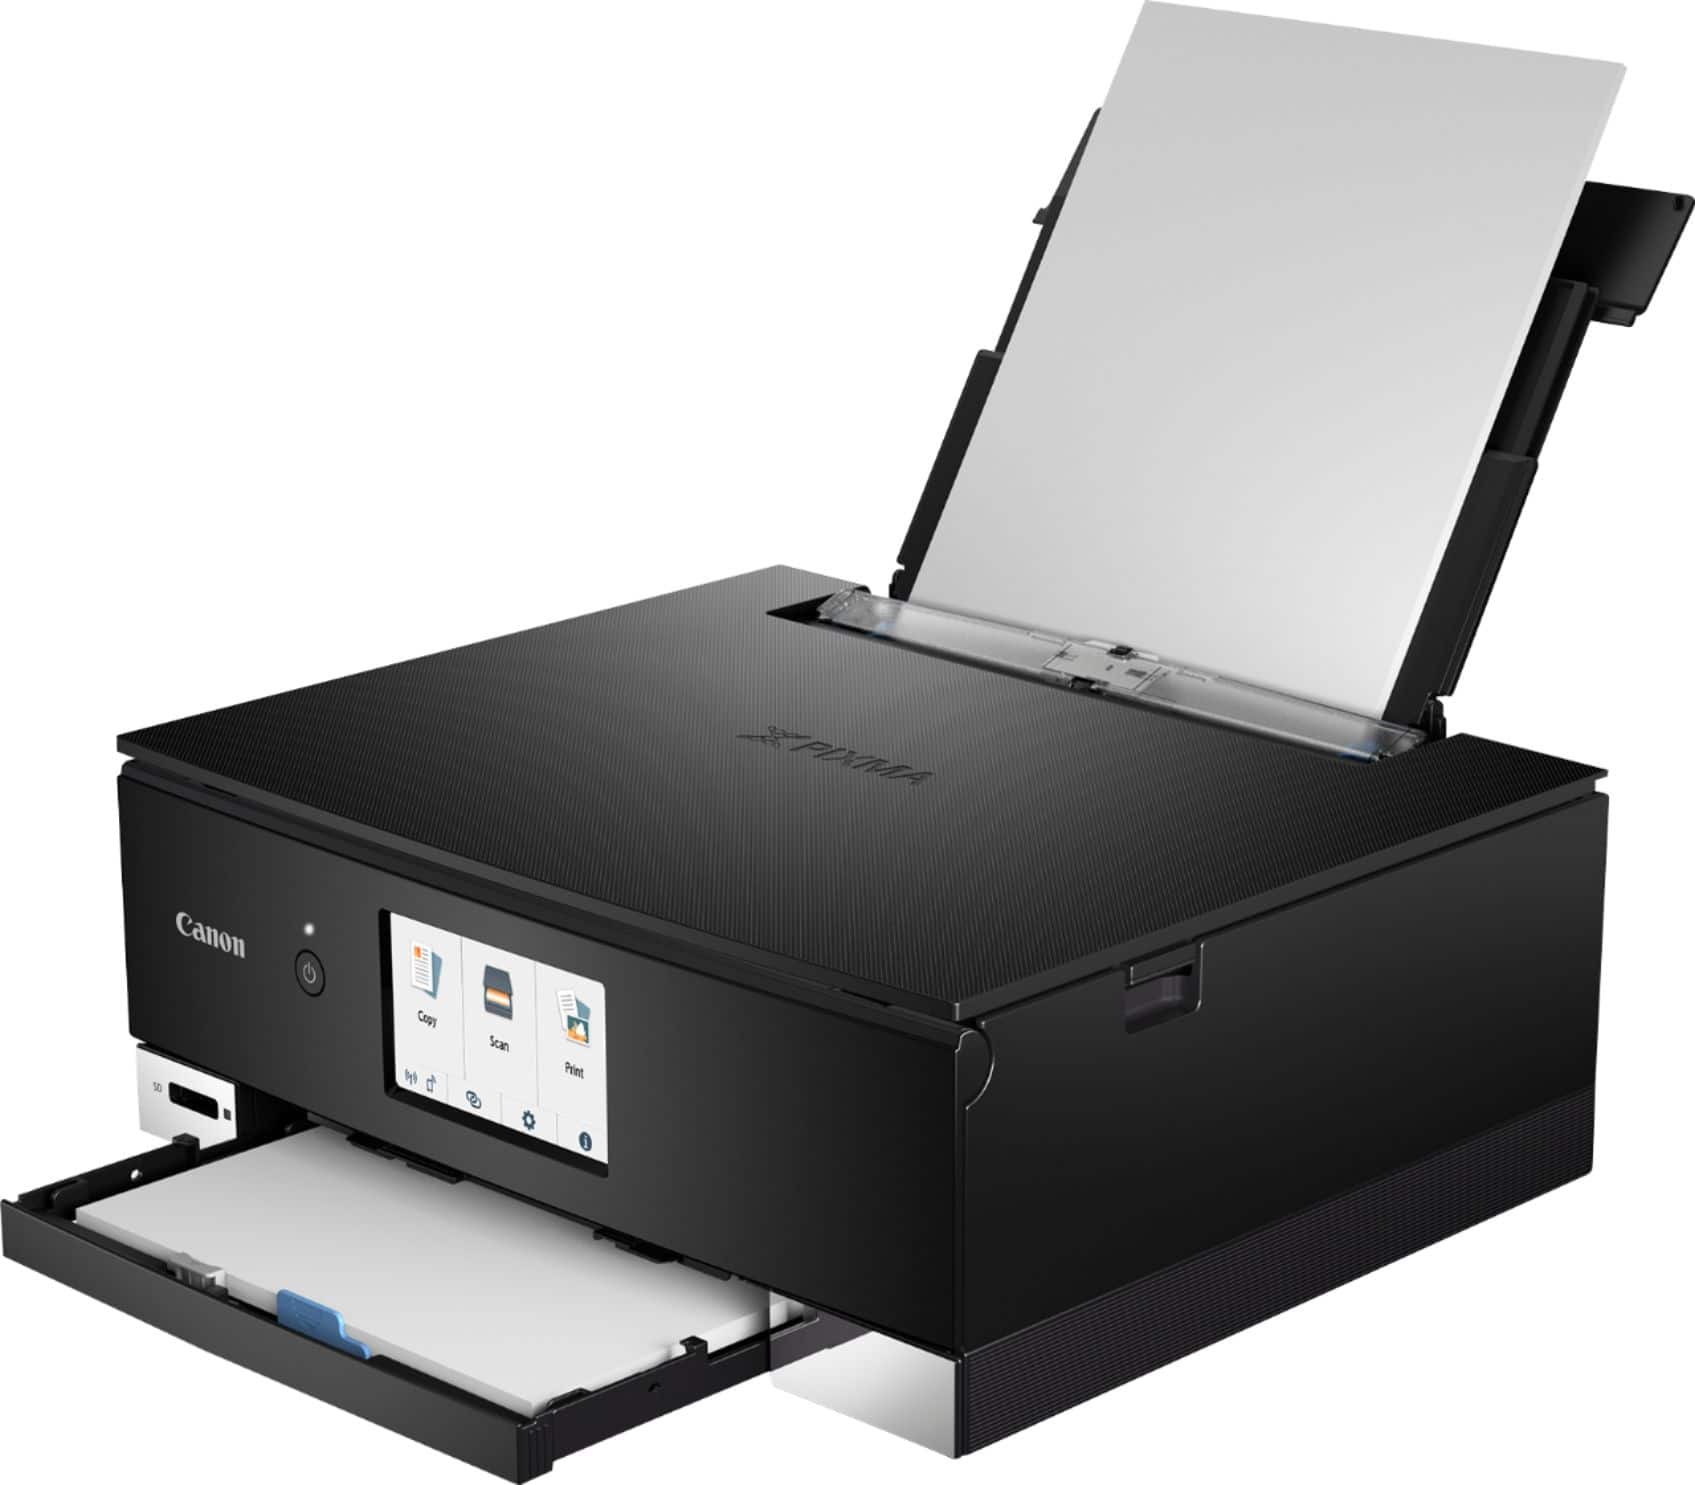 Canon PIXMA TS8220 Wireless All-In-One Printer Black 2987C002 - Best Buy $70